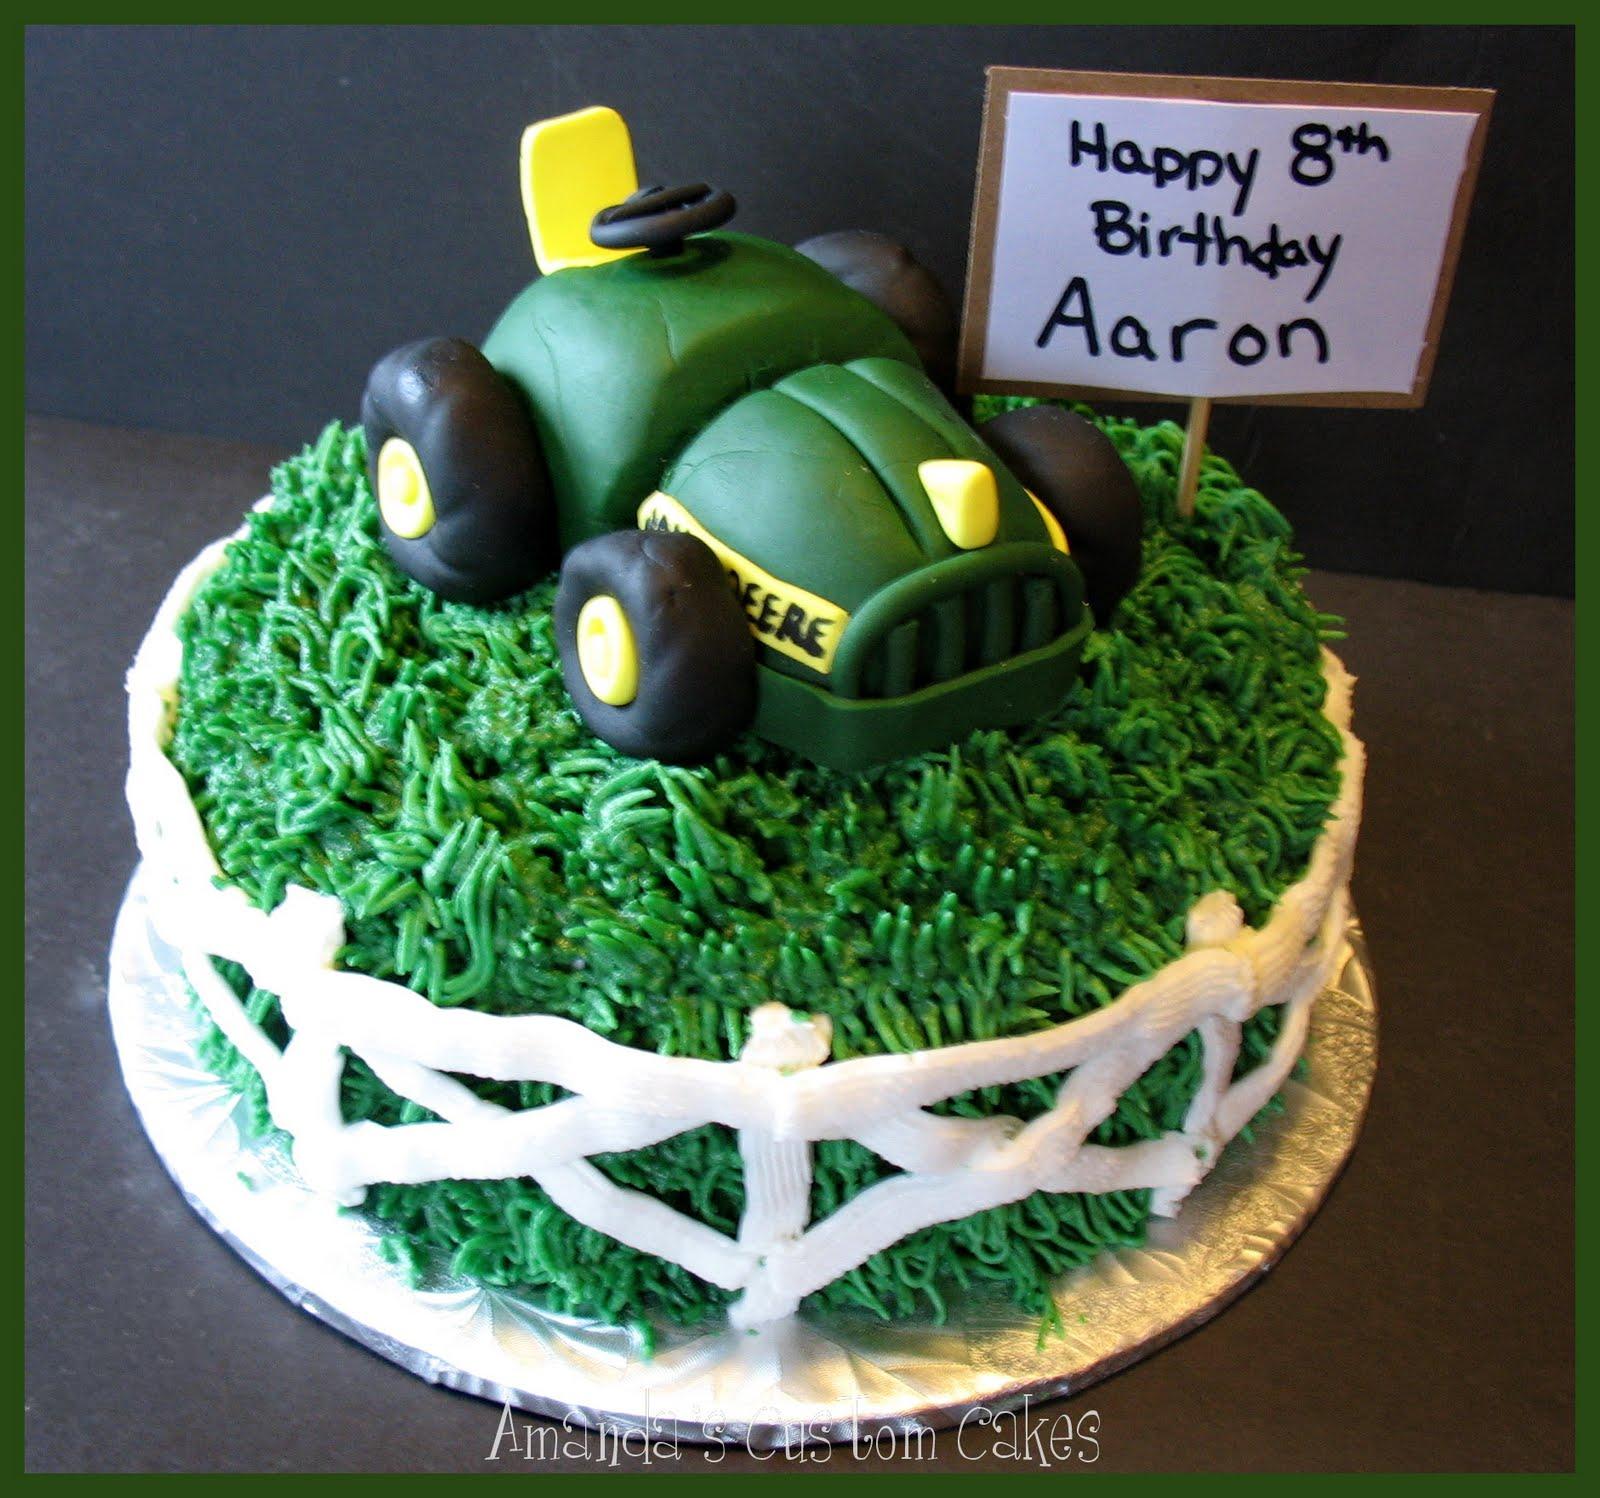 Amandas Custom Cakes John Deere Tractor and skateboard cakes